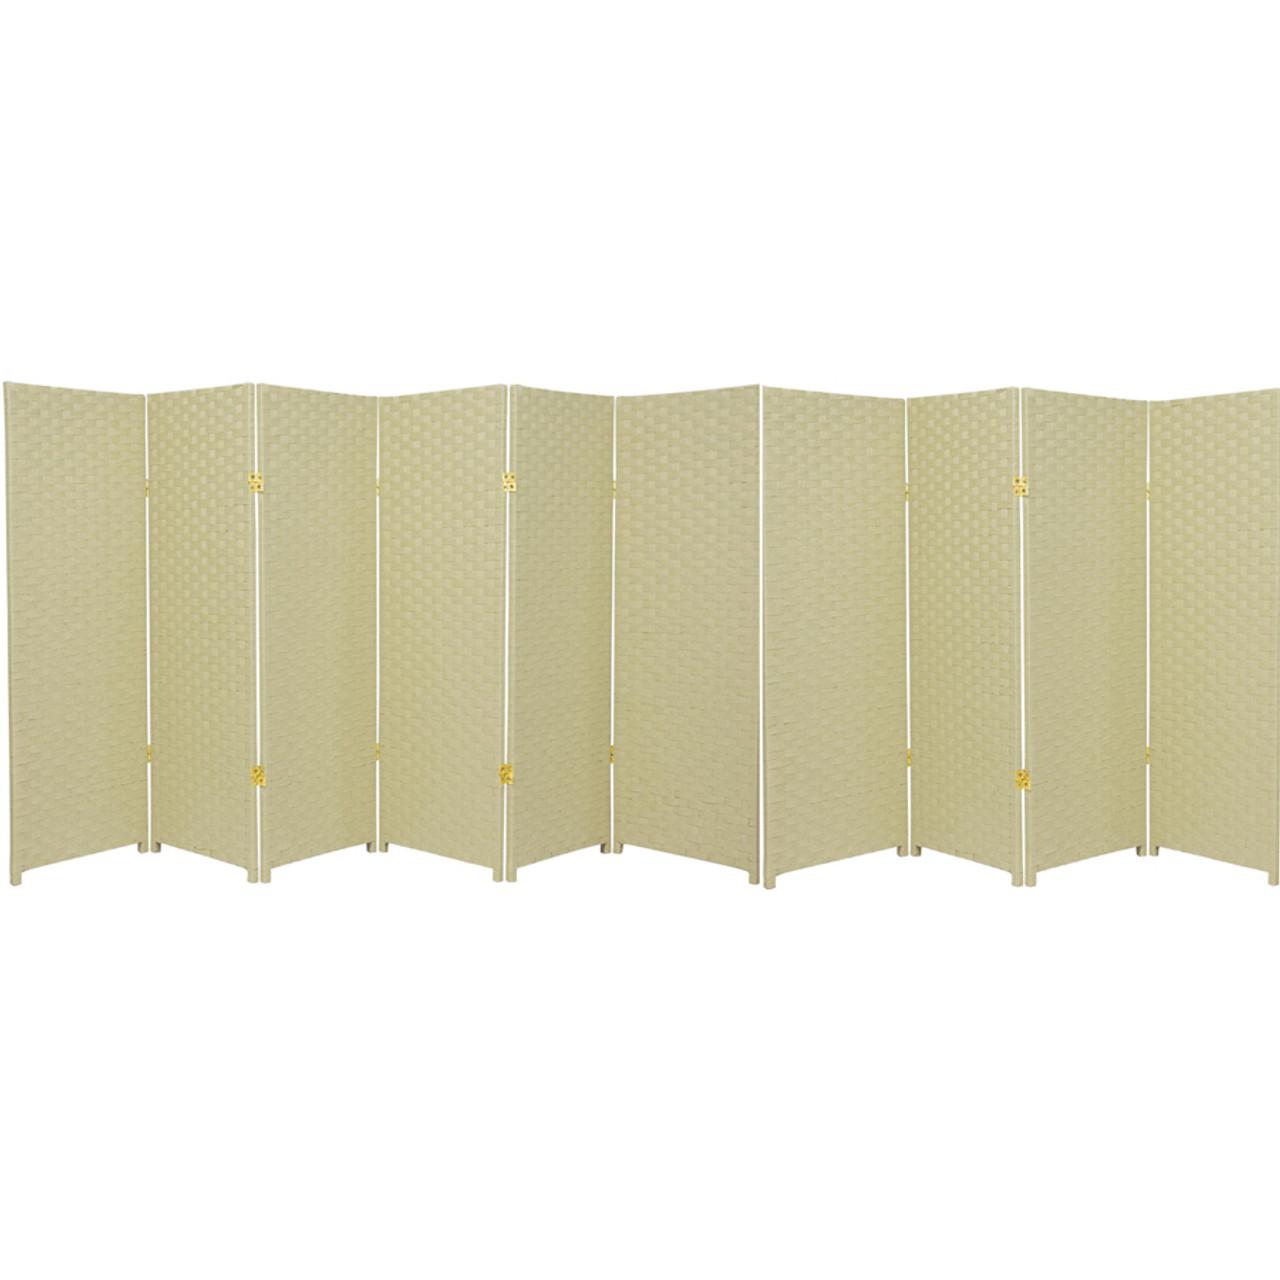 10 Panel Room Divider Privacy Screen, Bamboo Woven Panel in USA, California, NY, New York City, Los Angeles, San Francisco, Pennsylvania, Washington DC, Virginia, Maryland